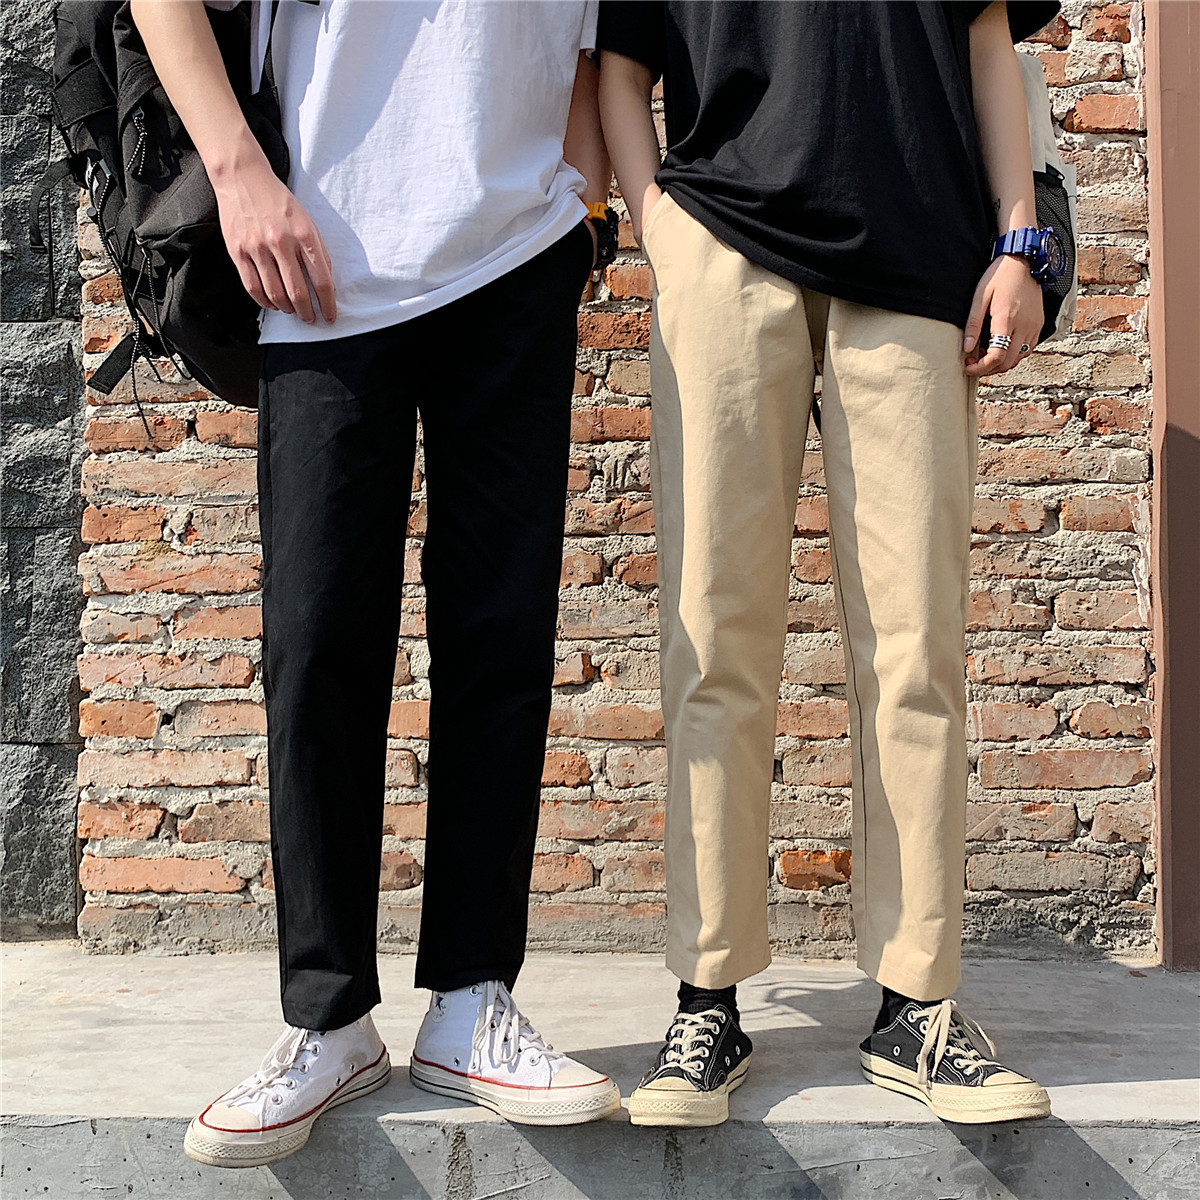 INS Super Fire Bib Overall Men's Popular Brand Hong Kong Style Pendant Sense Loose Pants Straight-leg Pants Summer Loose-Fit Jap